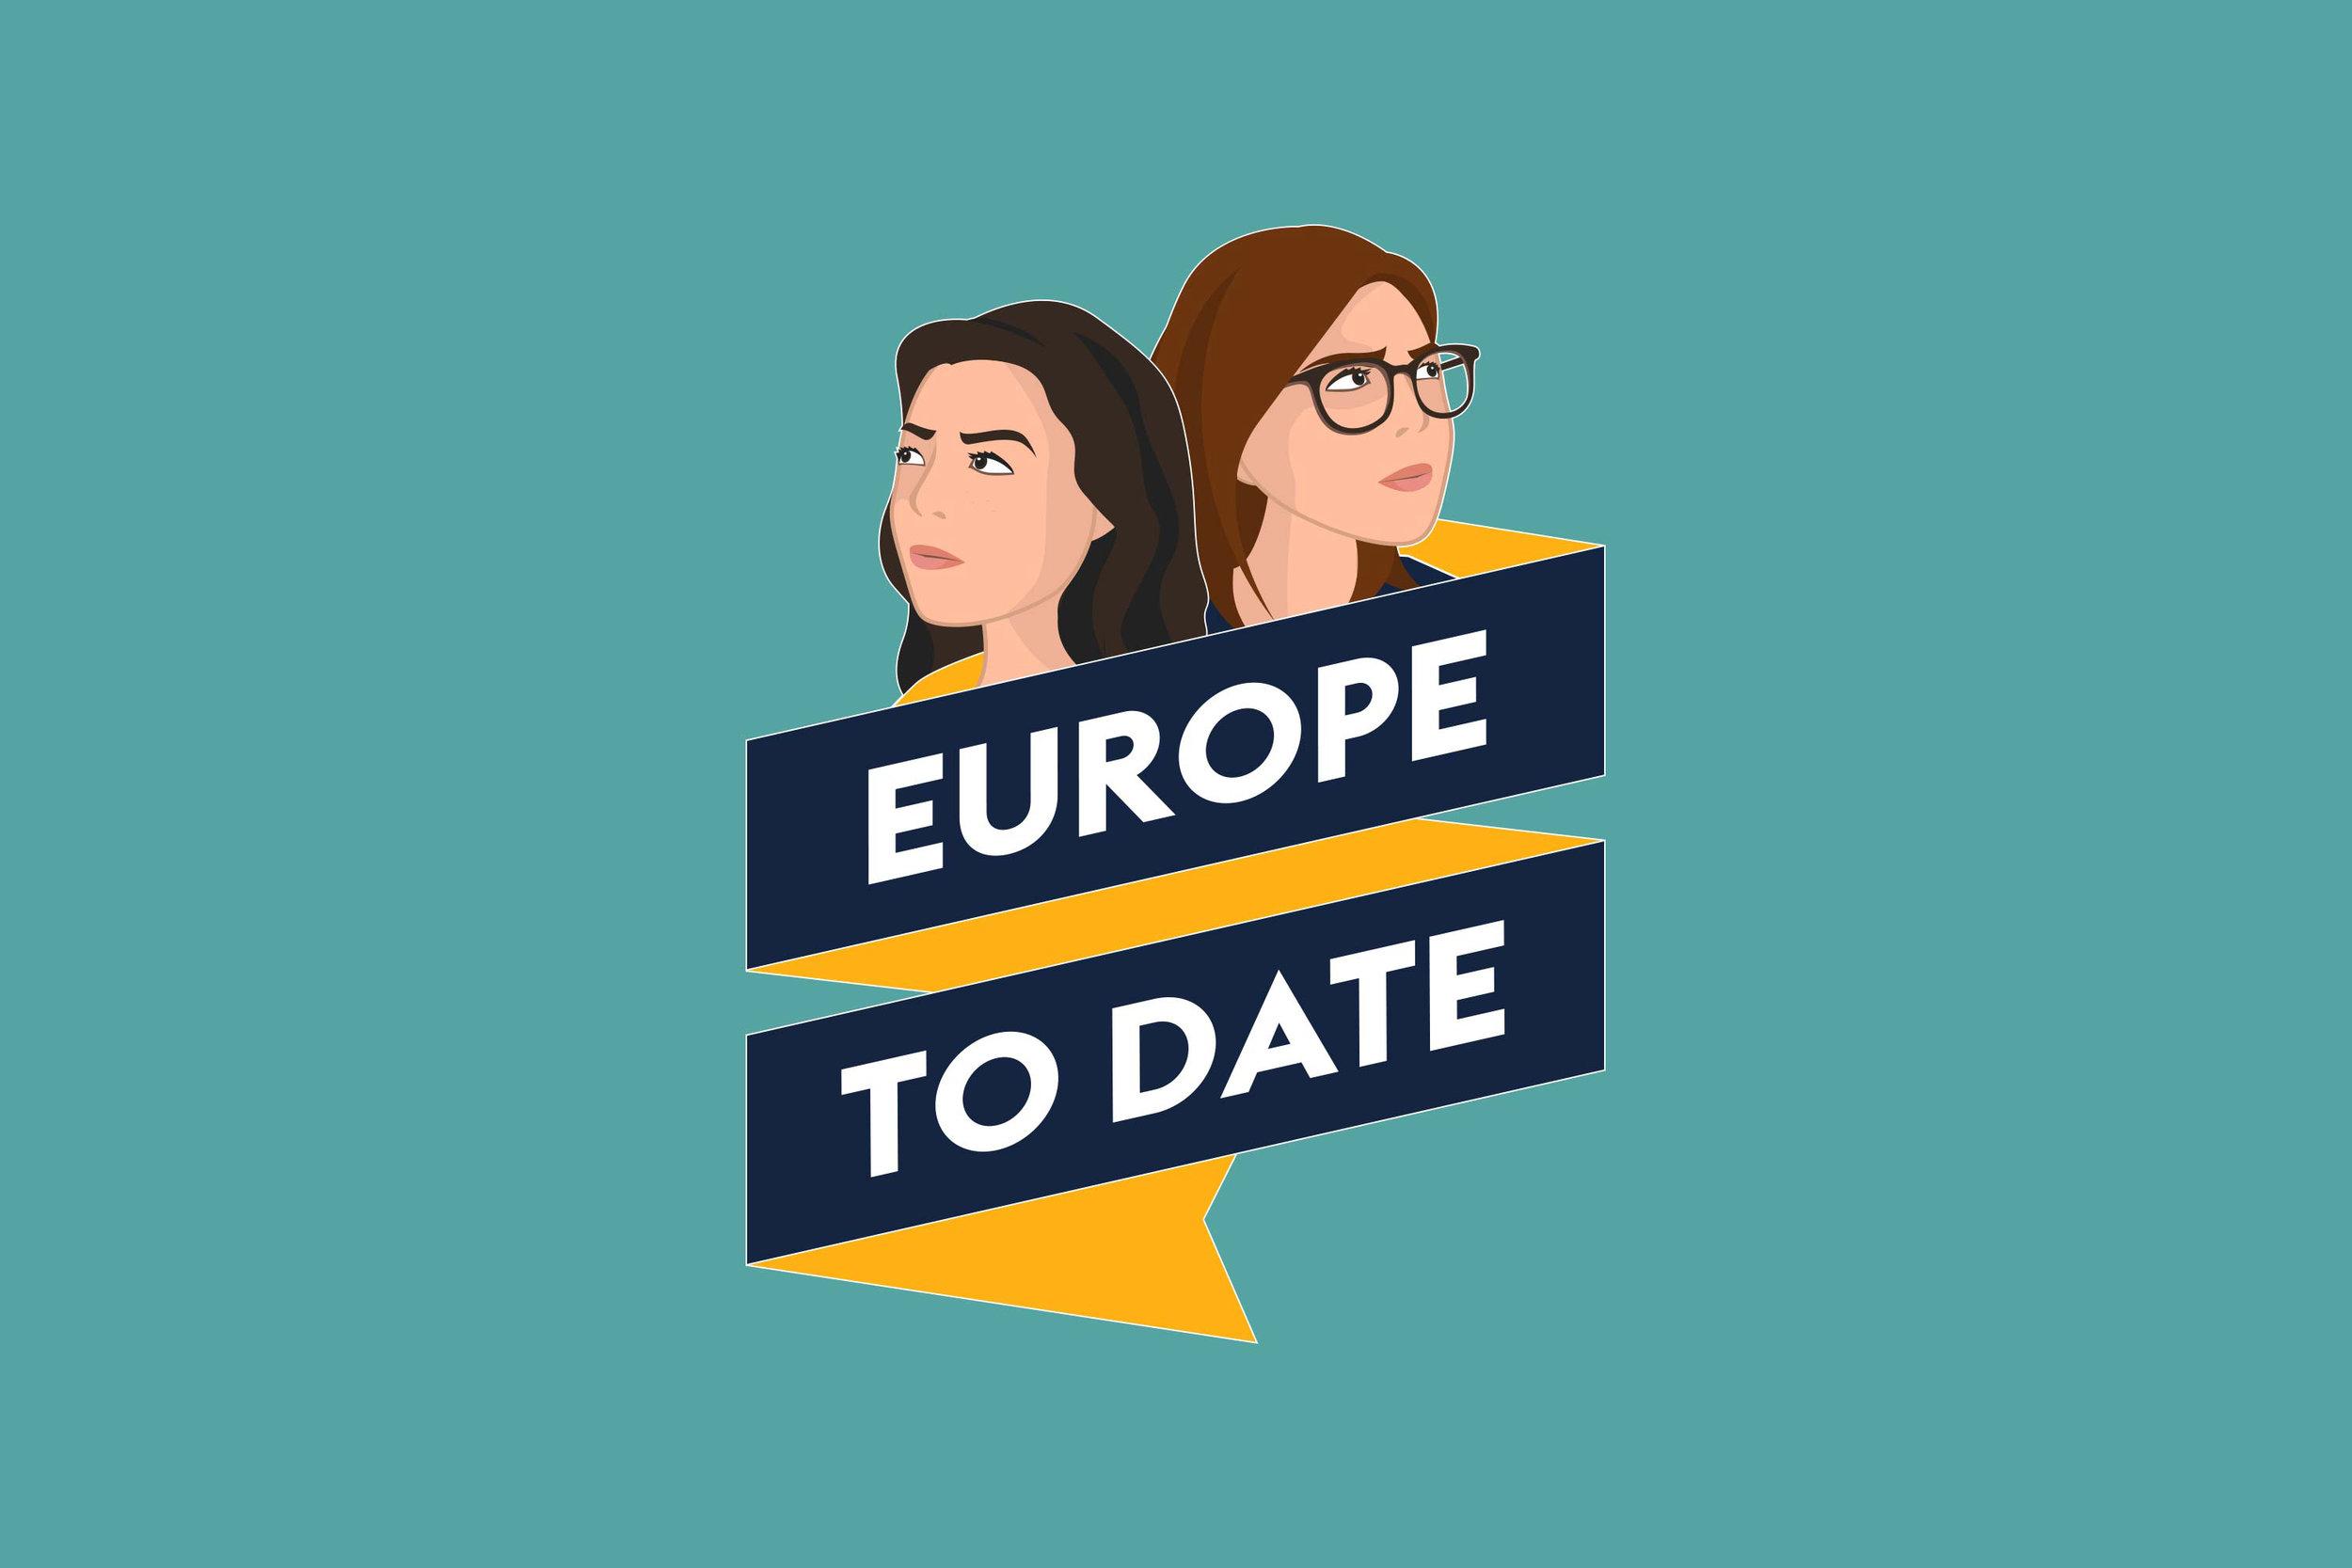 EuropetoDate.jpg